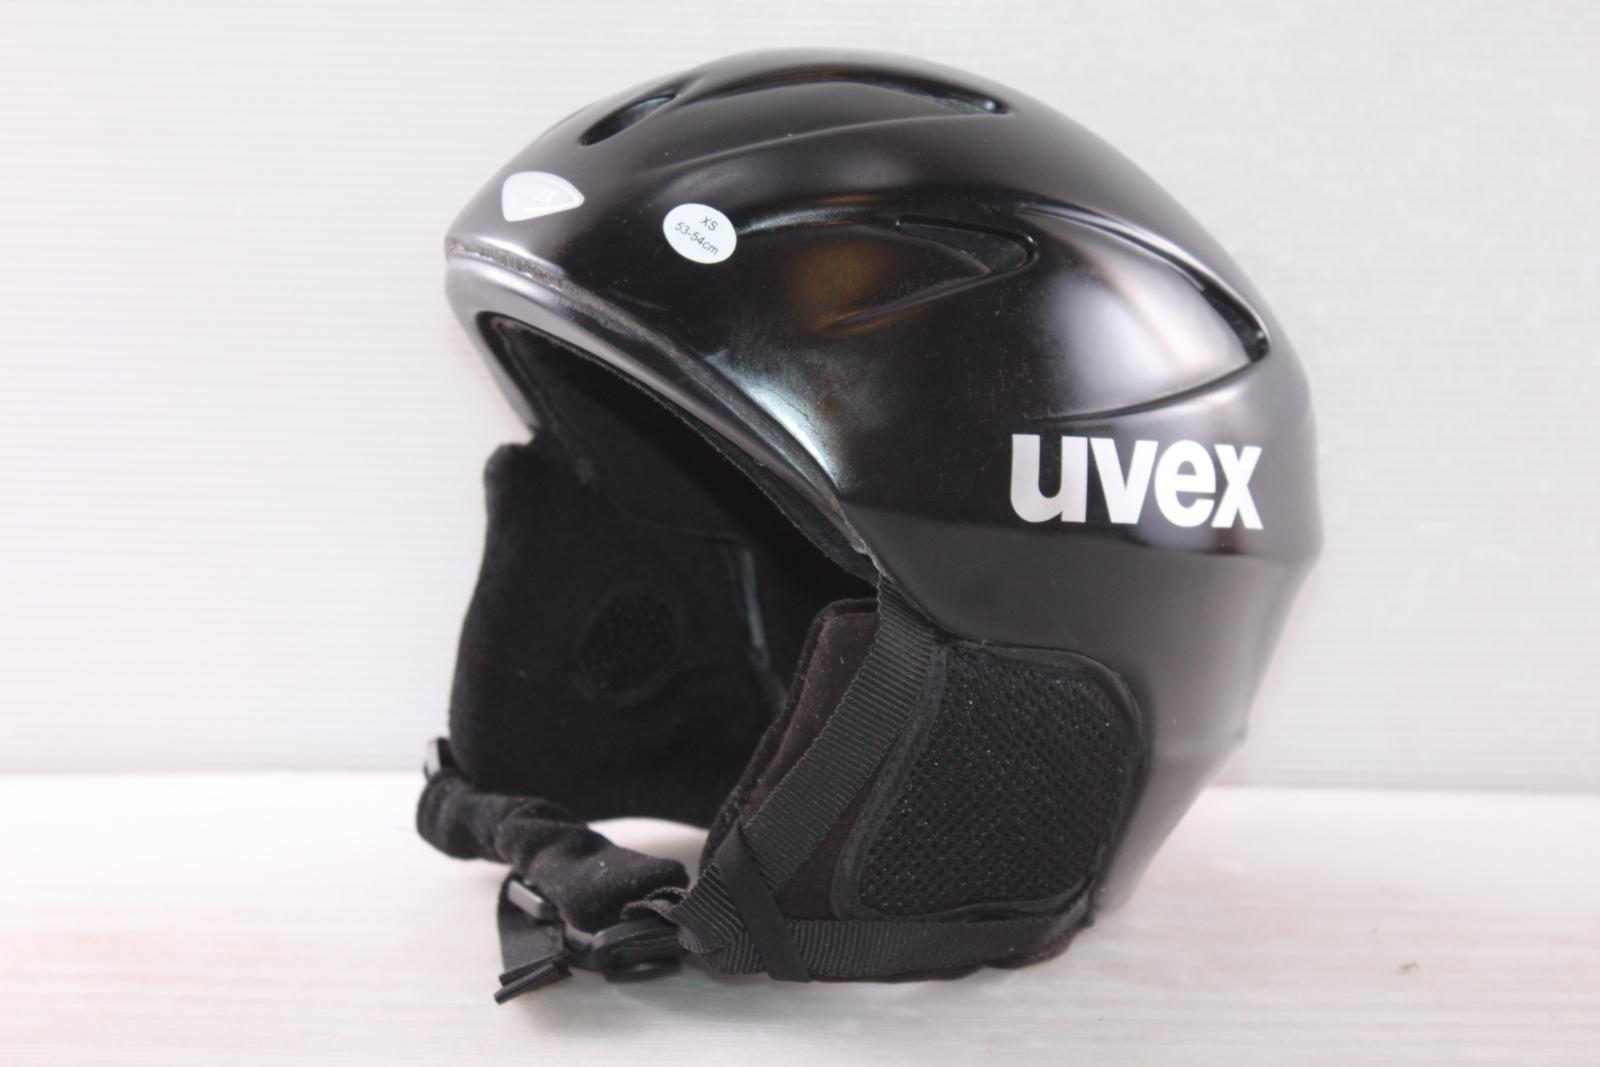 Dětská lyžařská helma Uvex Uvex - posuvná vel. 53 - 54